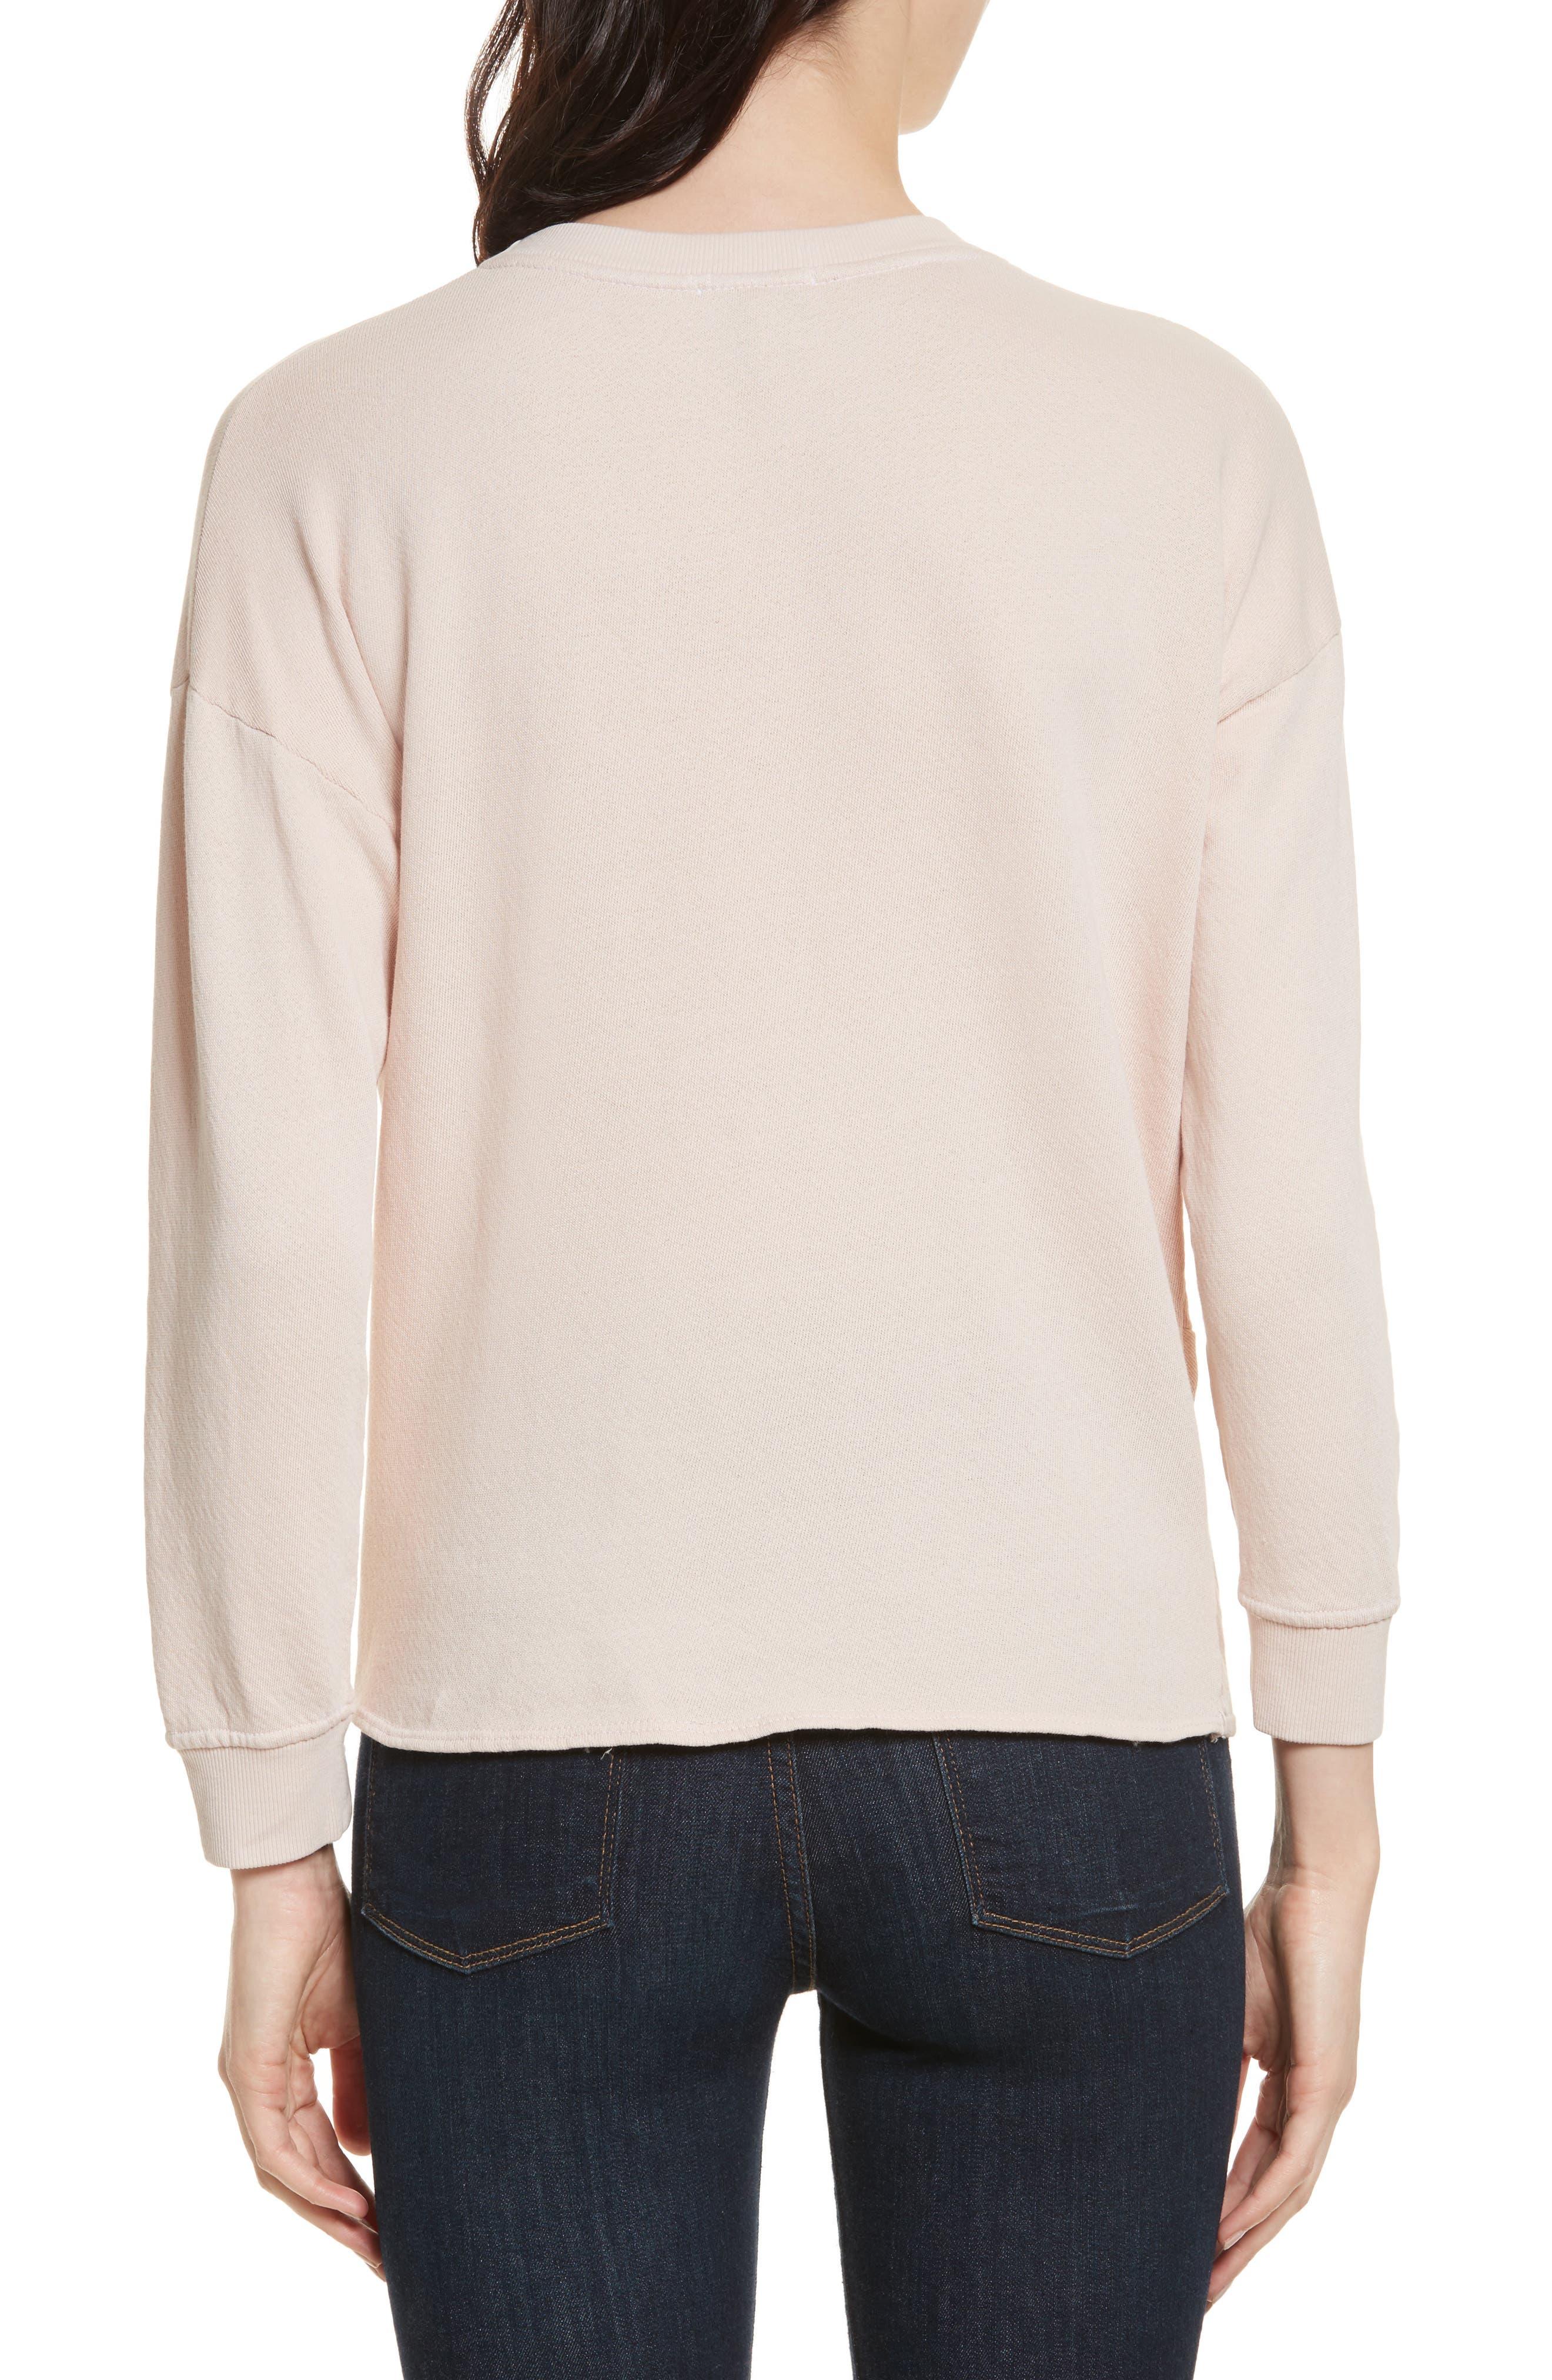 Nazani Twist Front Sweatshirt,                             Alternate thumbnail 2, color,                             Heather Rose